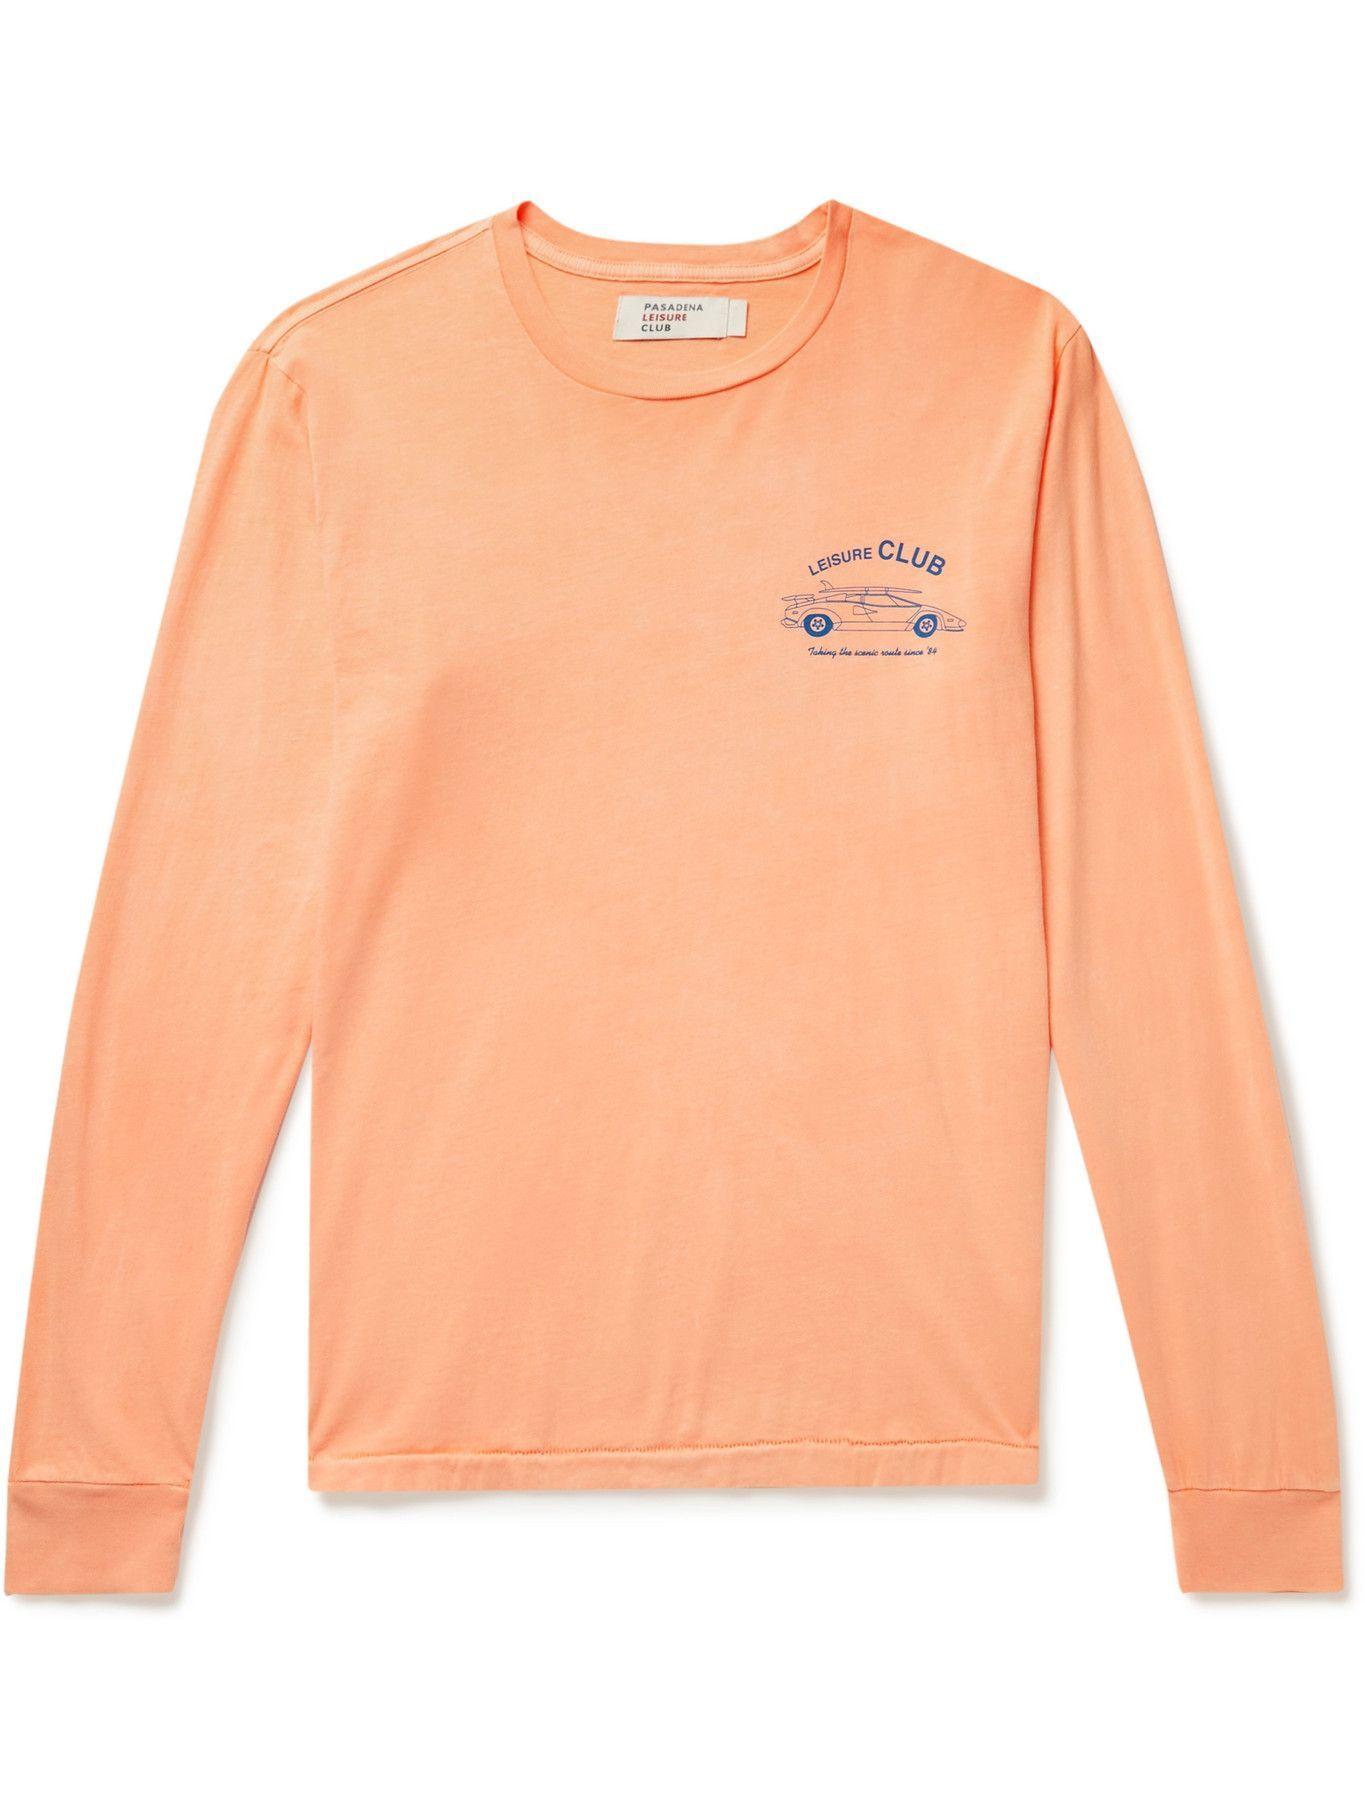 Photo: Pasadena Leisure Club - Scenic Route Cotton-Jersey T-Shirt - Orange